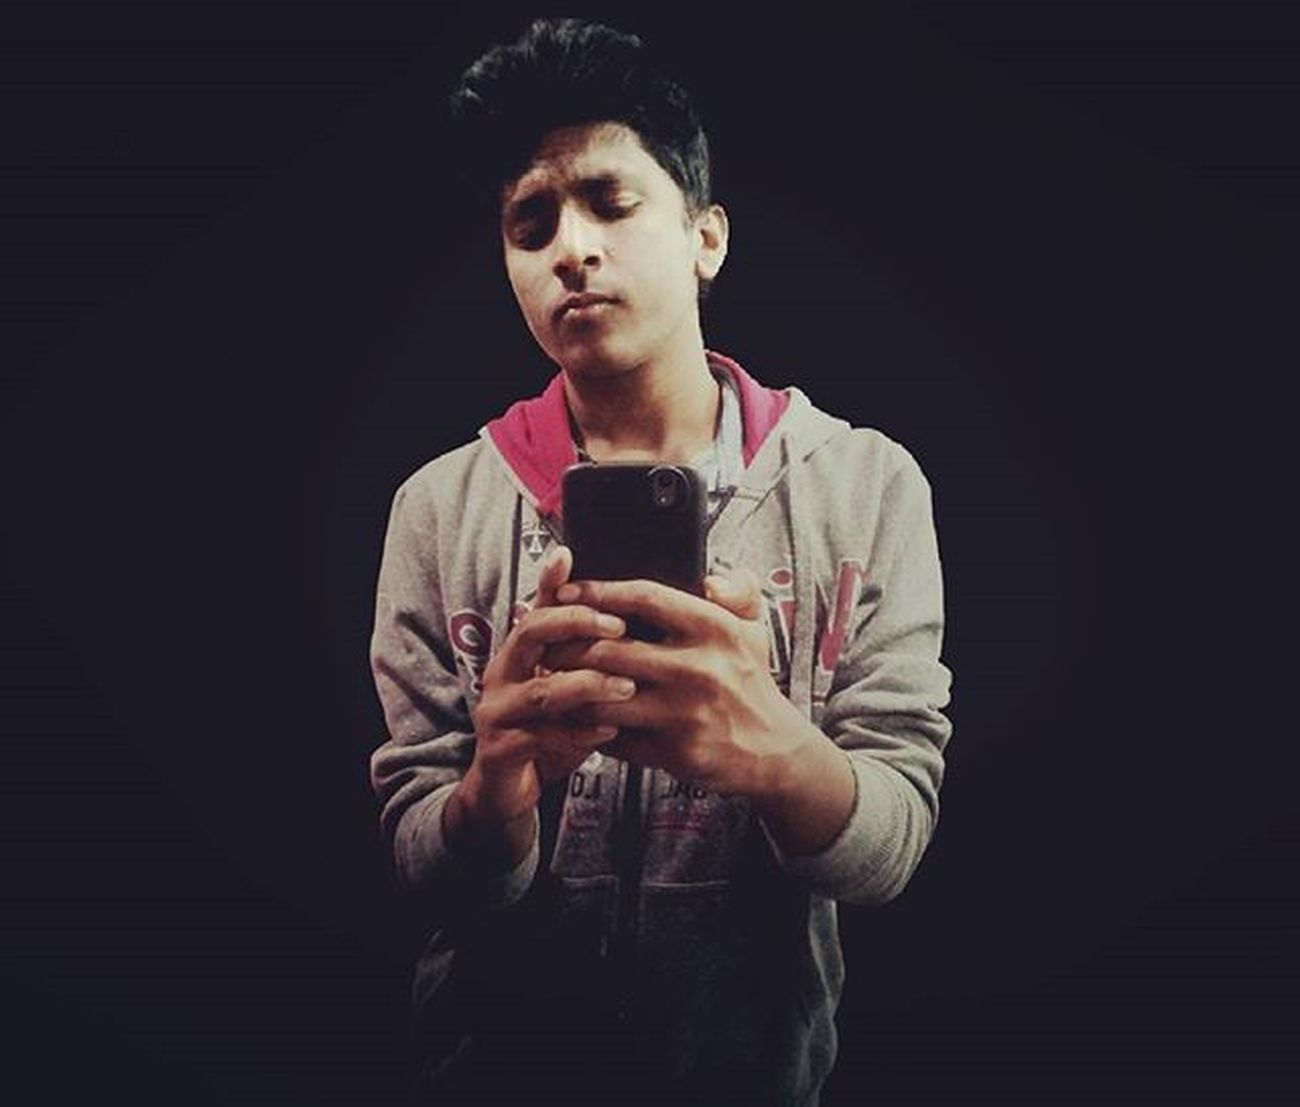 Me Selfie Mirror Winter Bestone Picoftheday Instaedit Instagram Filter Instacool Black Fade Jacket Doubletap Like4like Like4follow Instalikes Awesome Swag Picsart